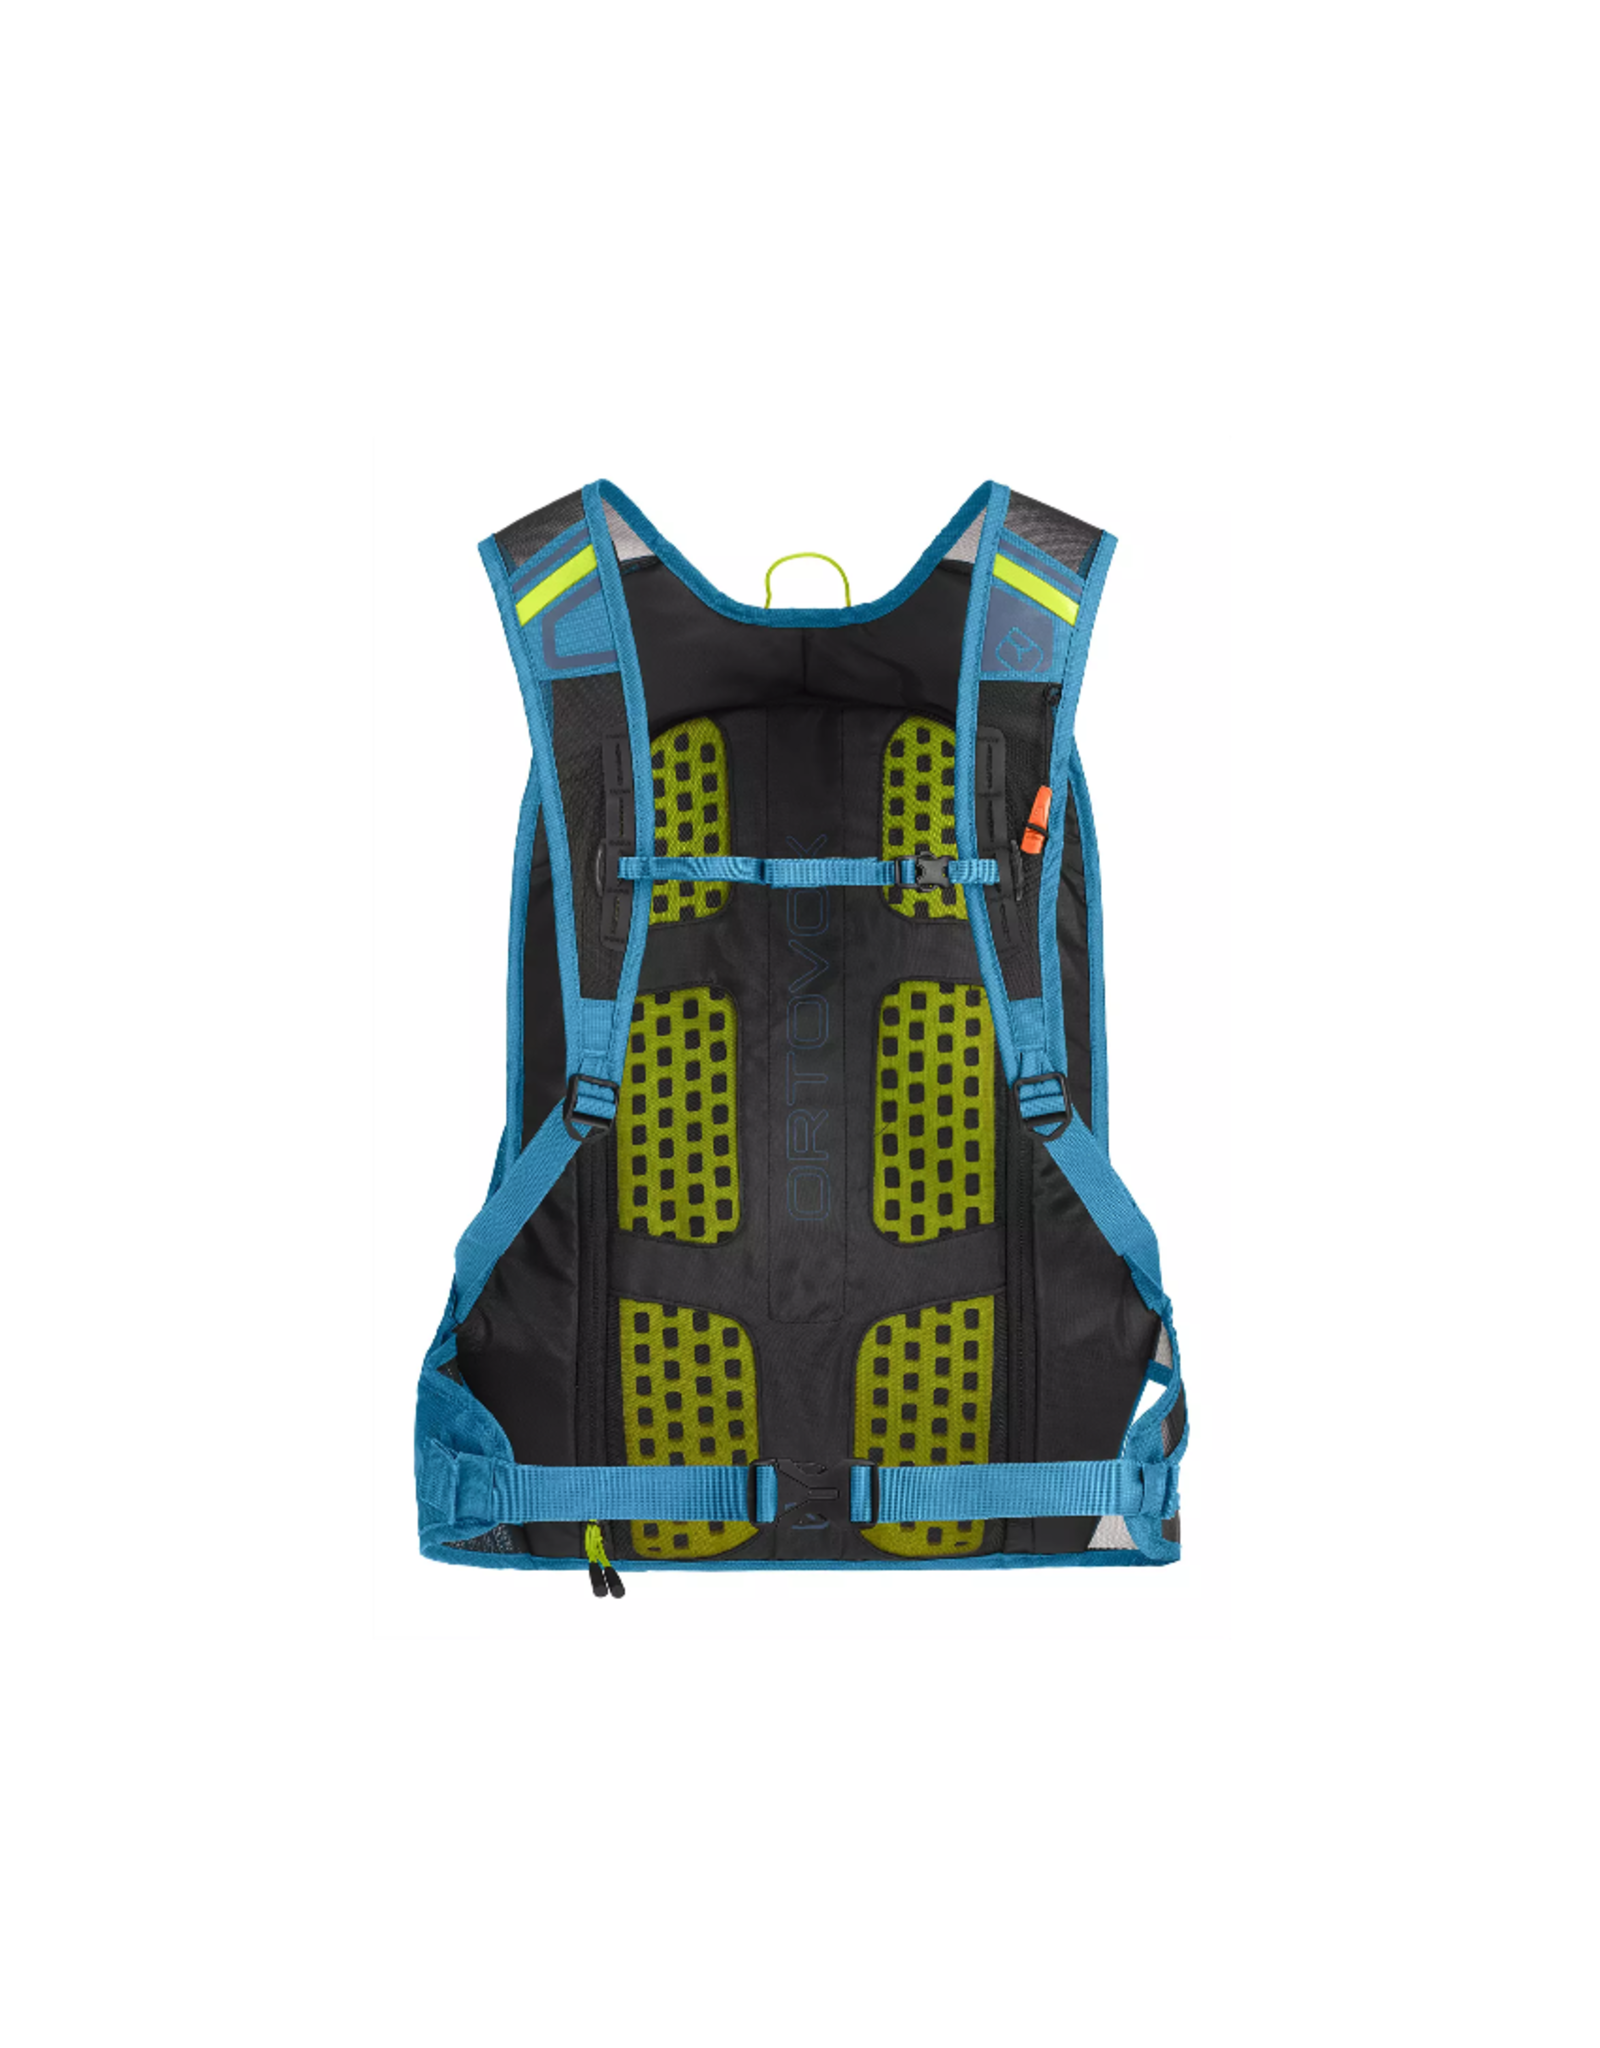 Ortovox Trace 23S Packs